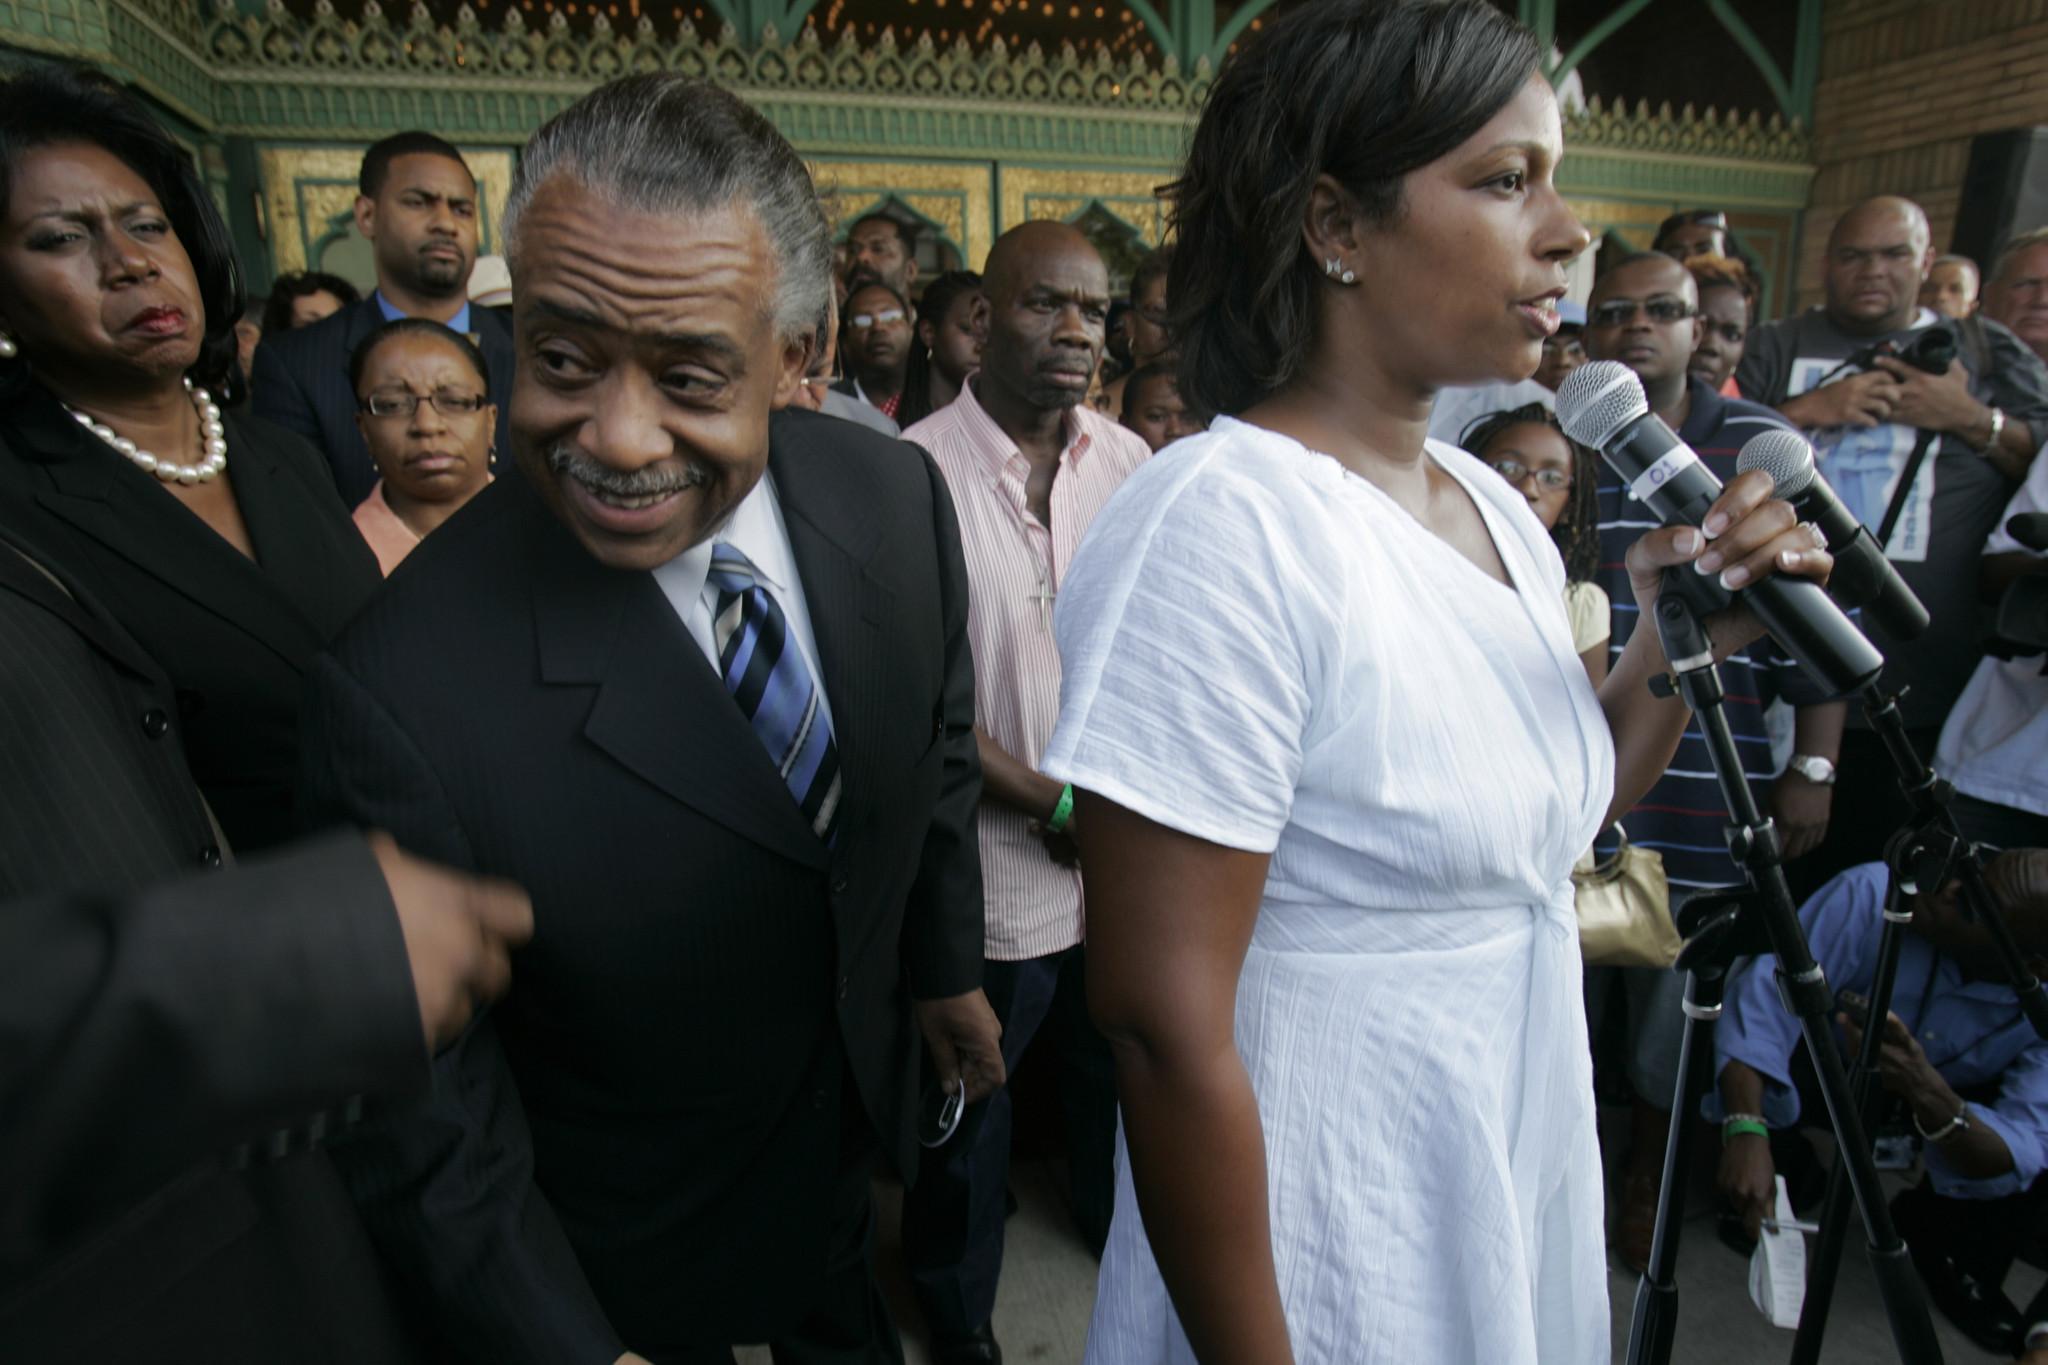 Daughter of former Obama pastor sent to jail after new allegations surface